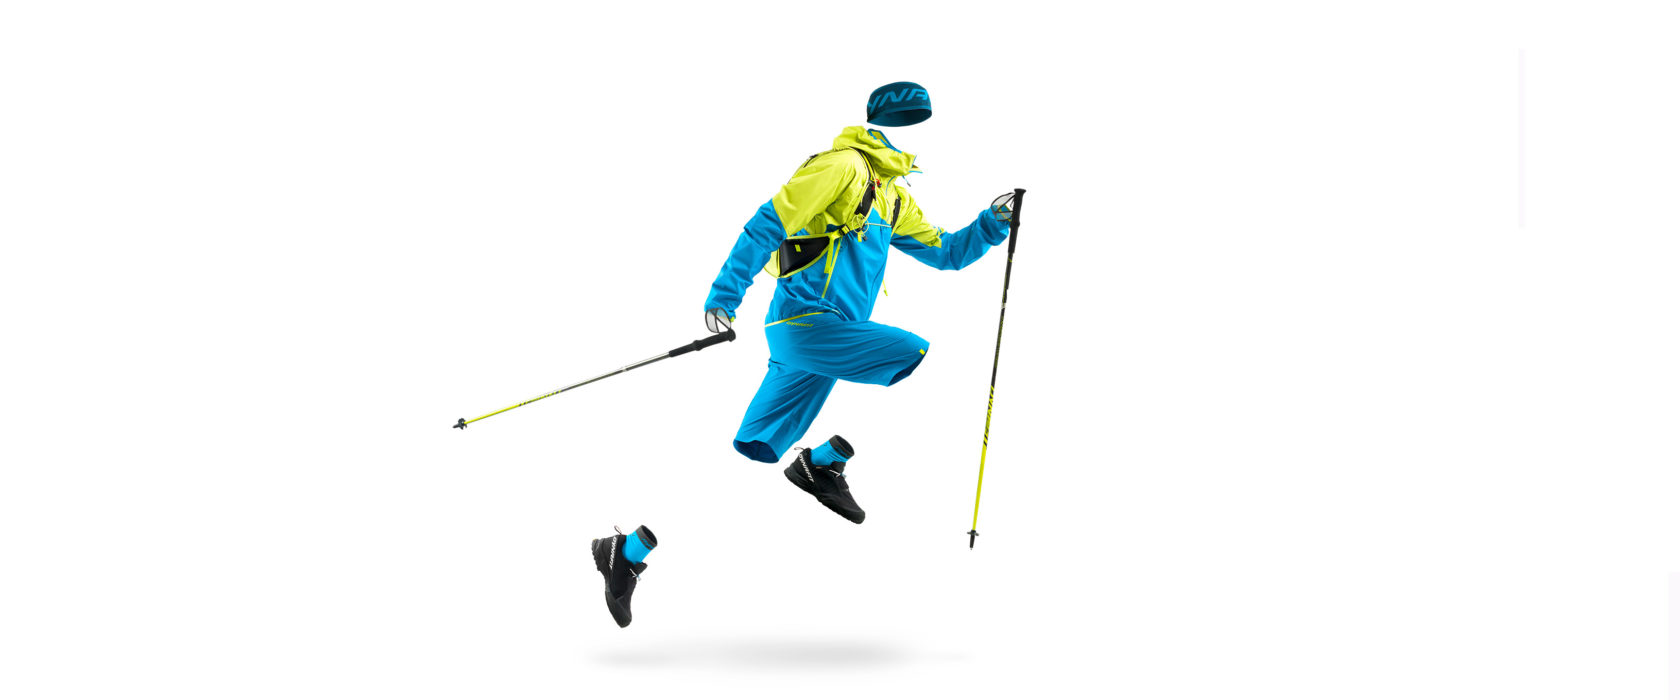 Dynafit Limit.Less: Alpin Ausrüstung unter 1,5 kg